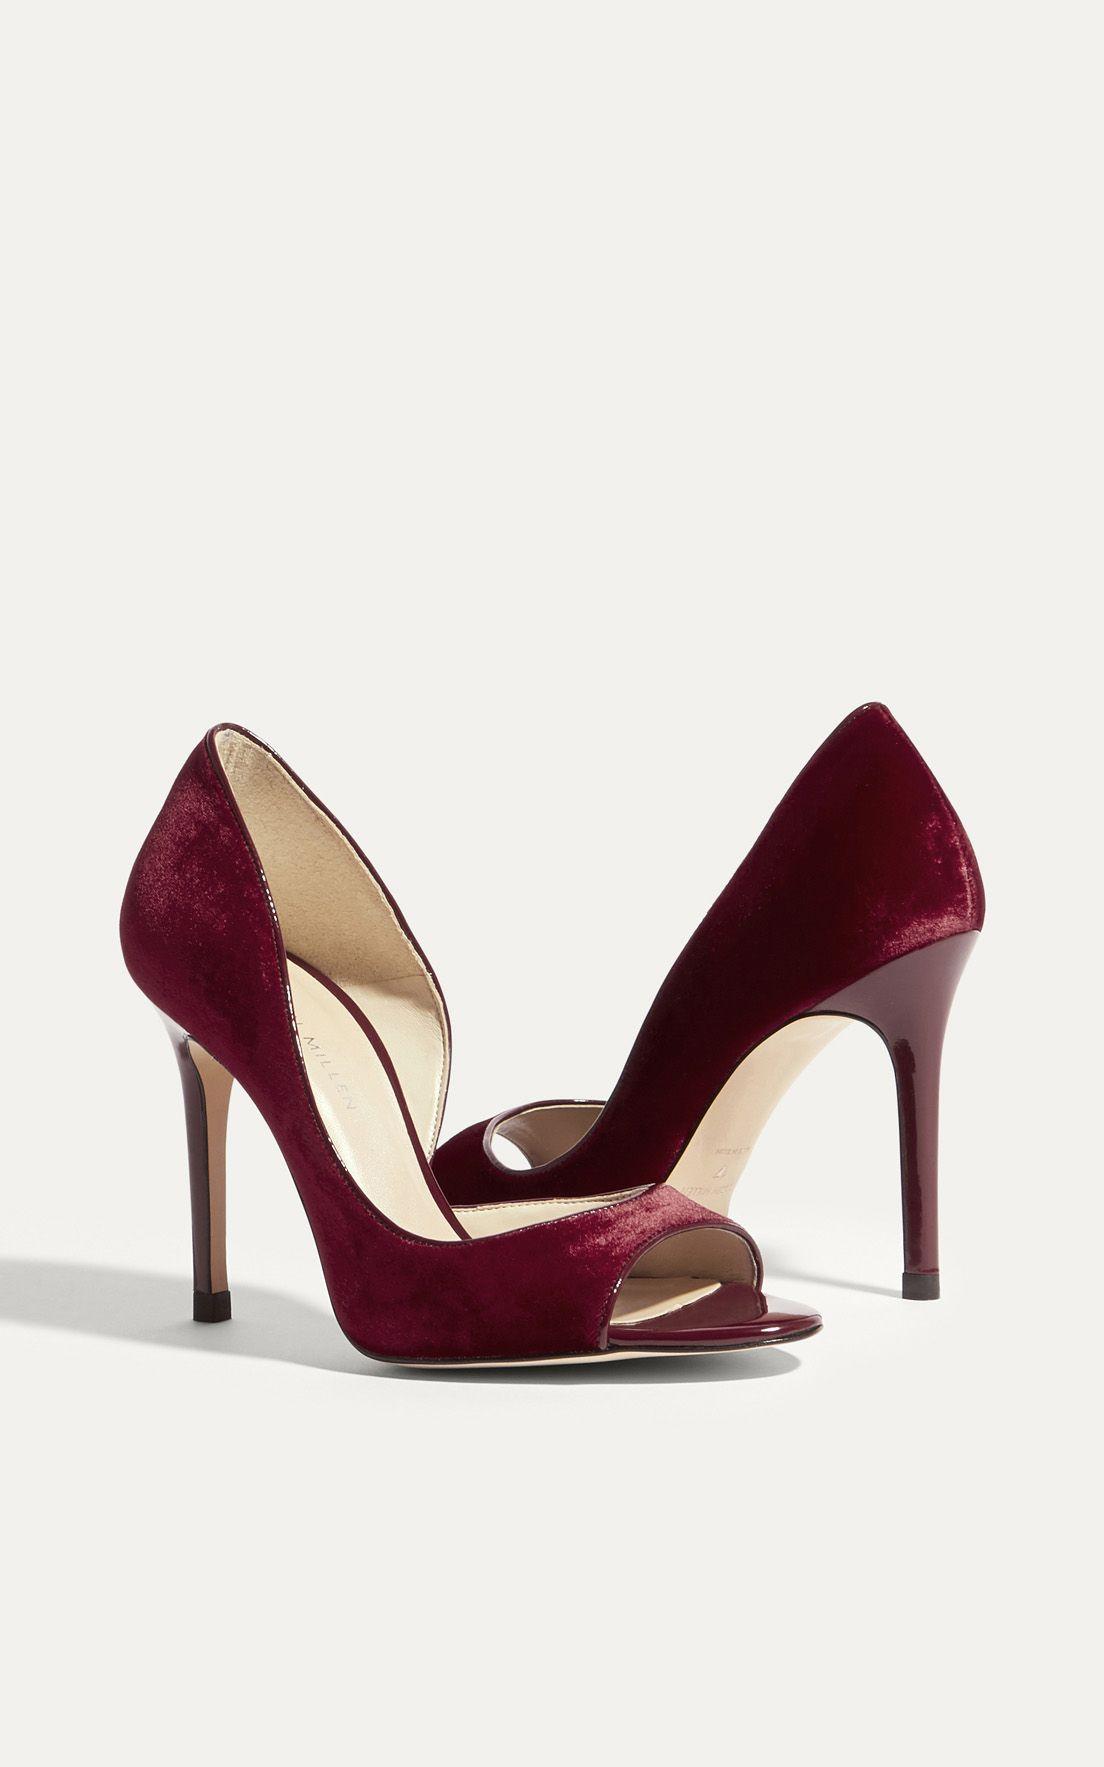 df5e7023d1b Karen Millen, VELVET OPEN-TOE COURT HEELS Red | Ready to Rep Brands ...